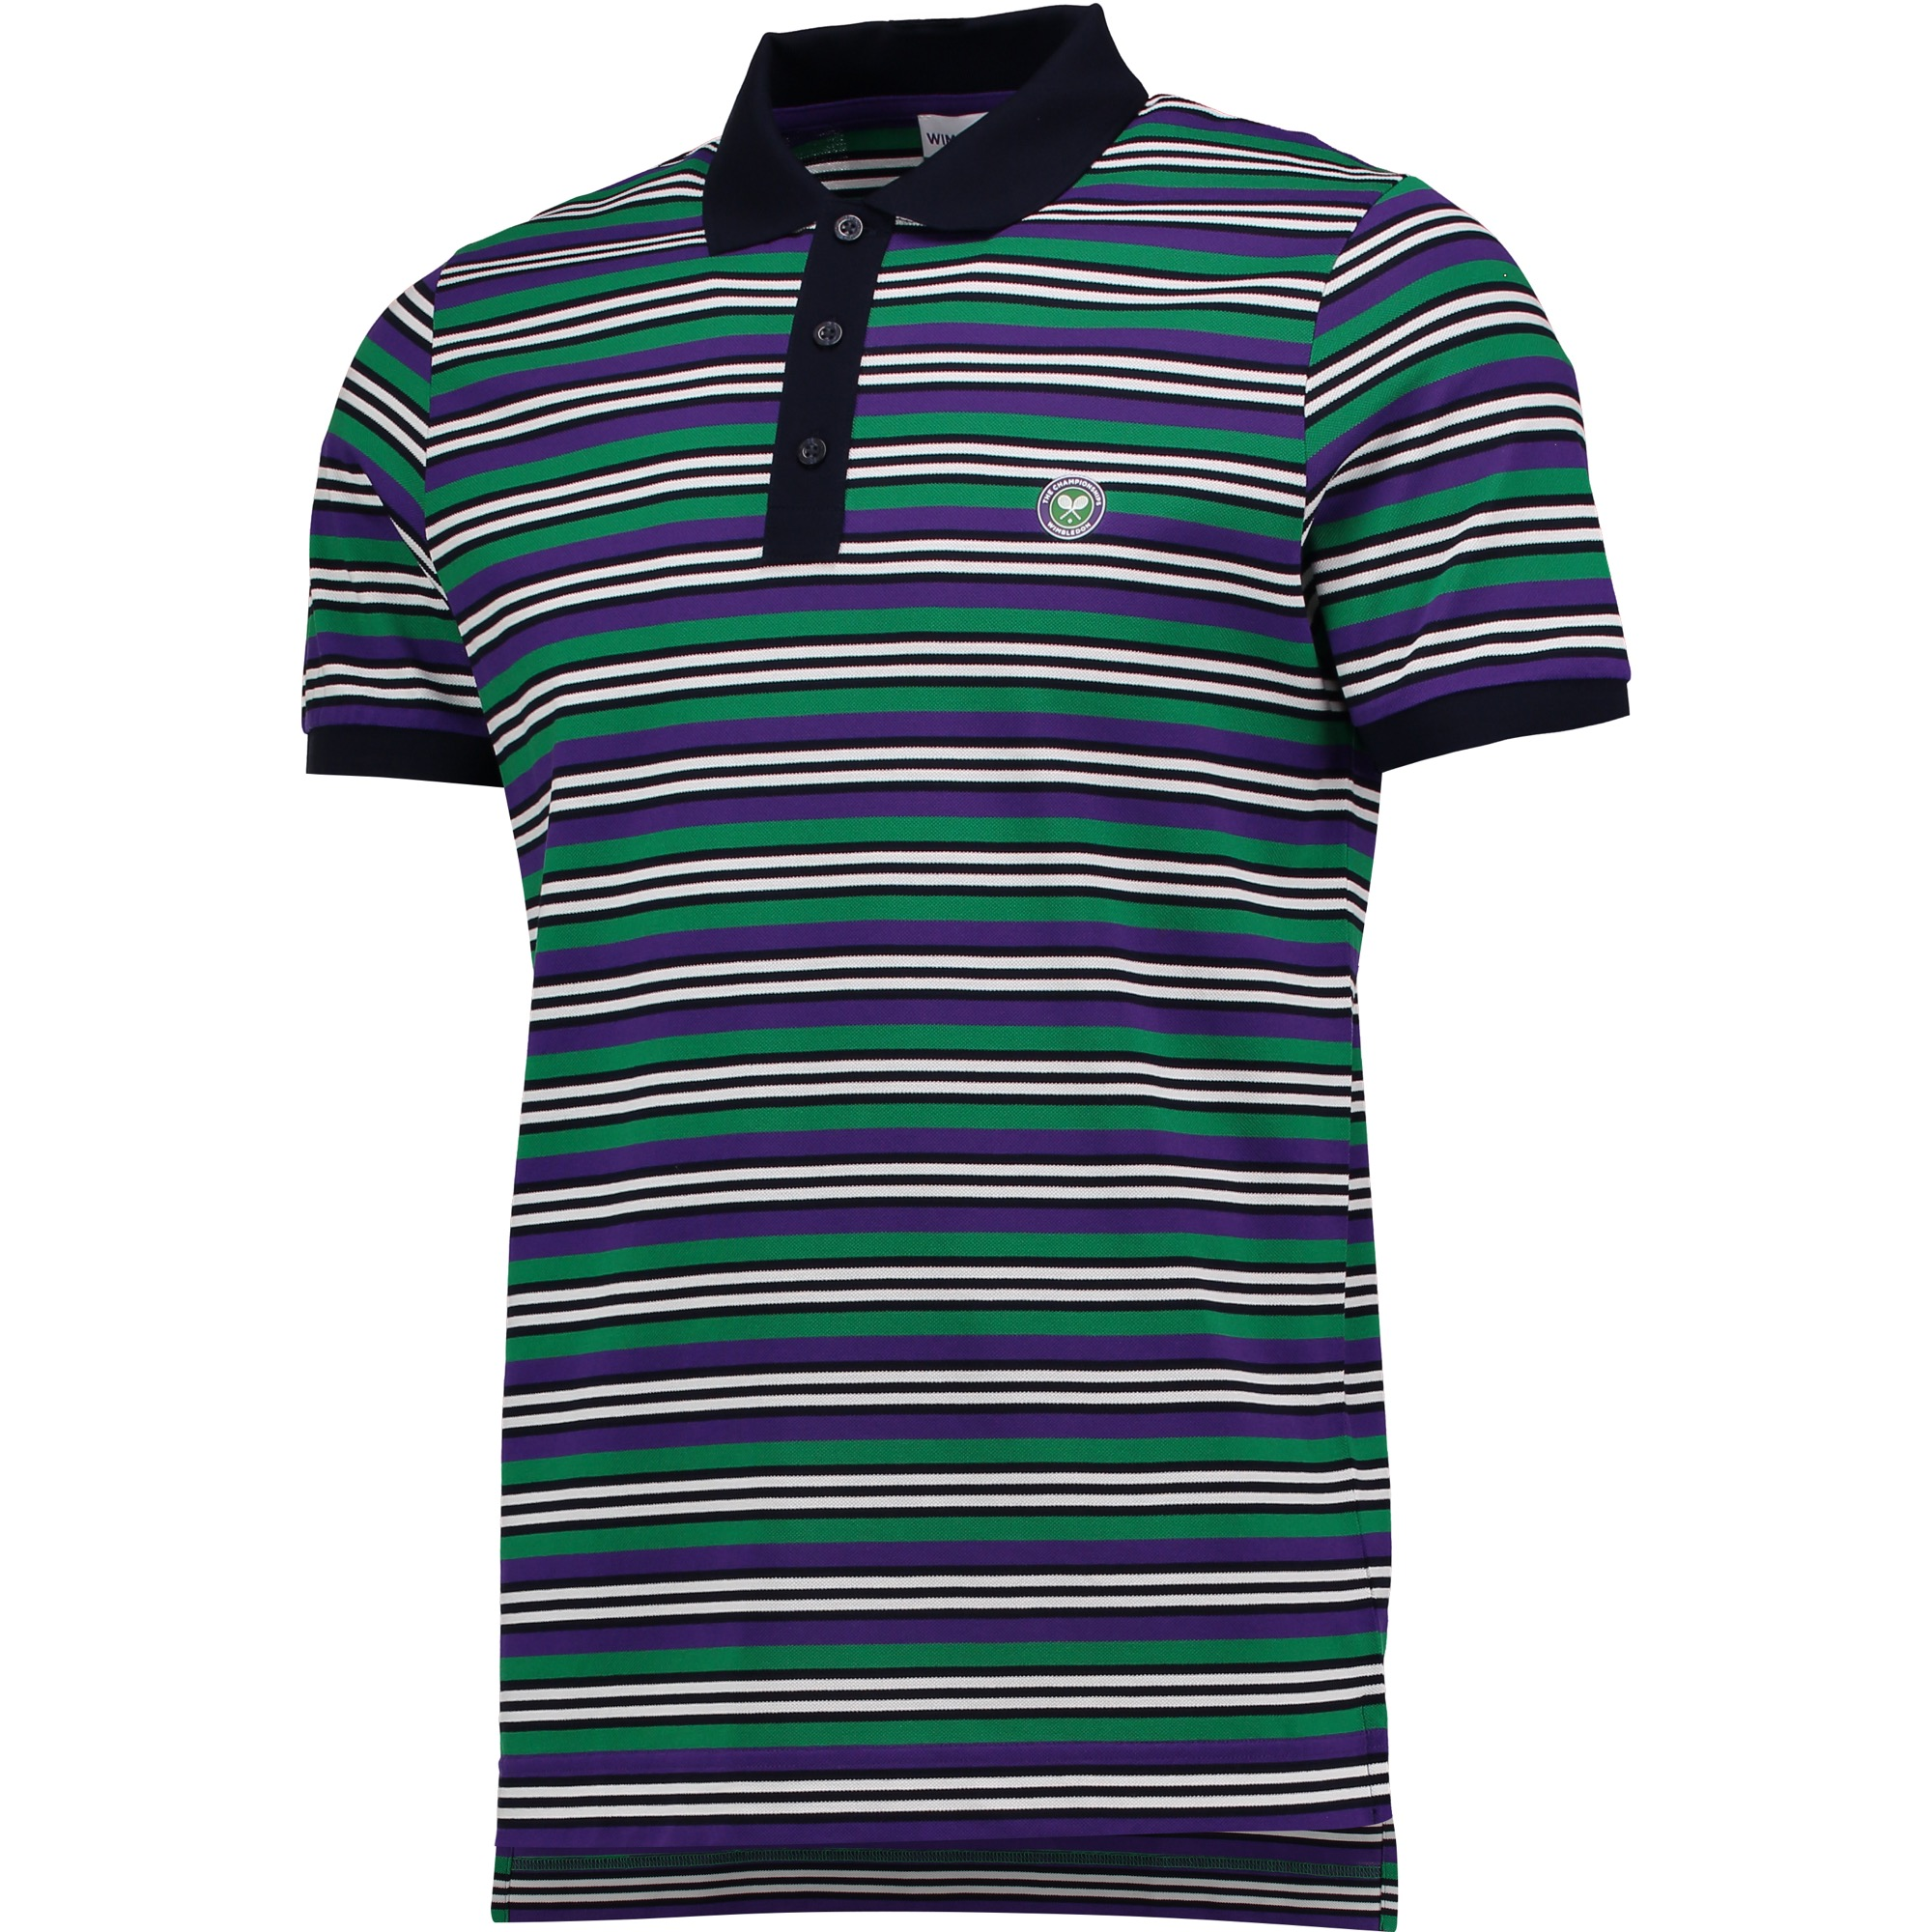 Wimbledon Contrast Stripe Polo Shirt - Midnight/Pansy